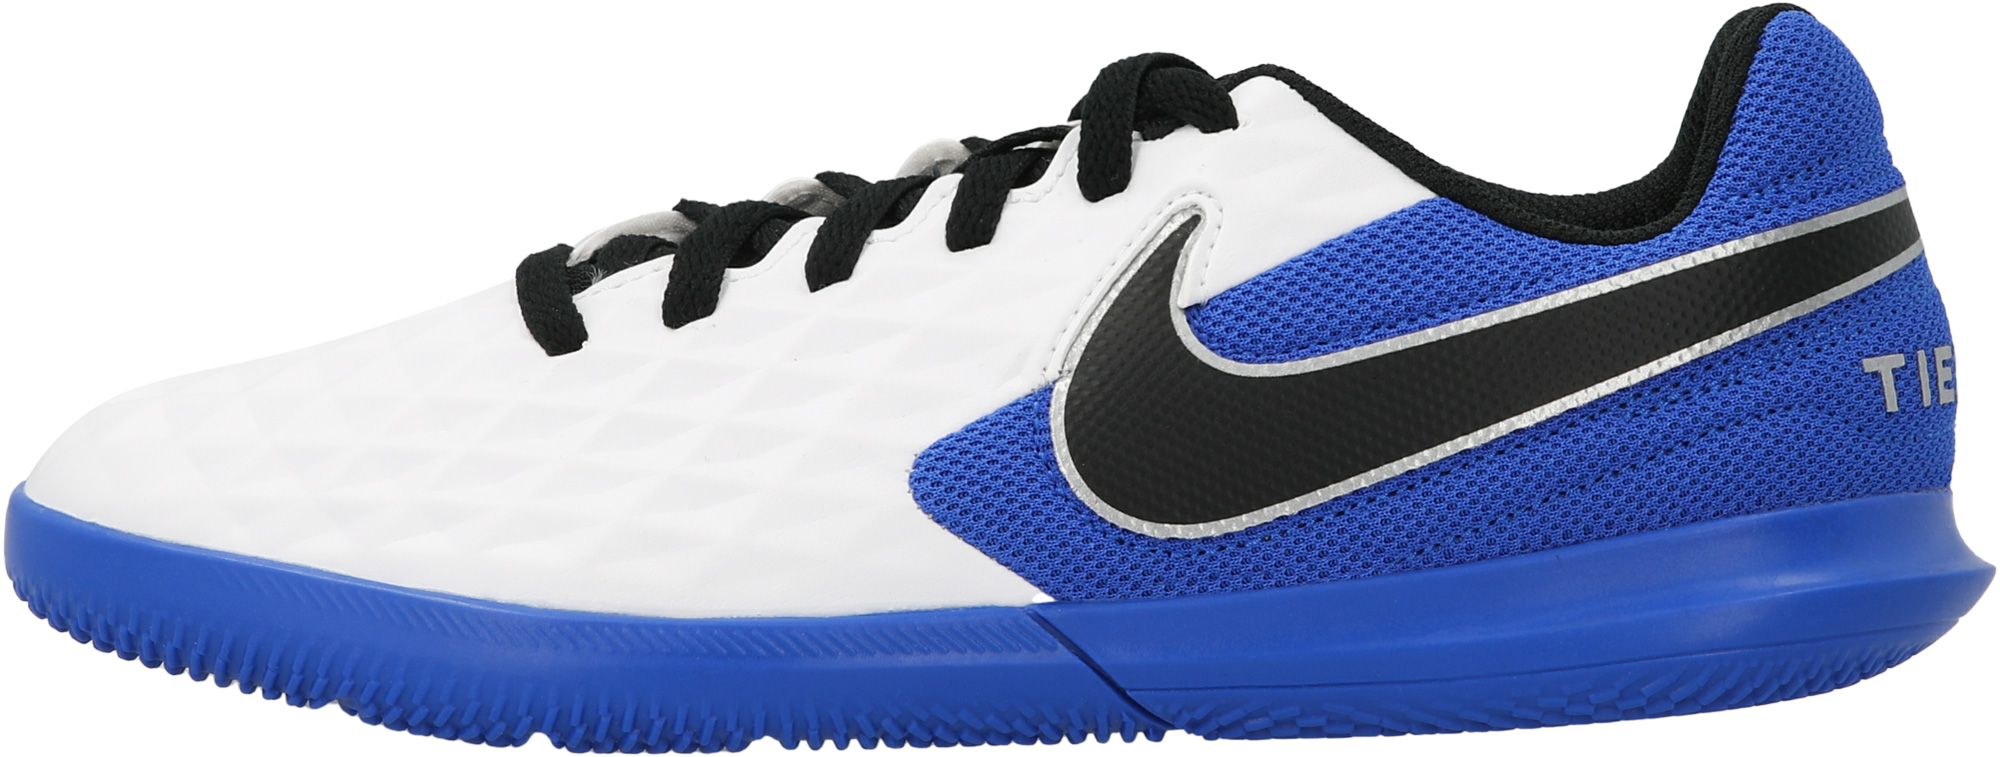 Nike Бутсы для мальчиков Nike Jr Legend 8 Club IC, размер 35.5 бутсы мужские nike legend 8 club ic размер 41